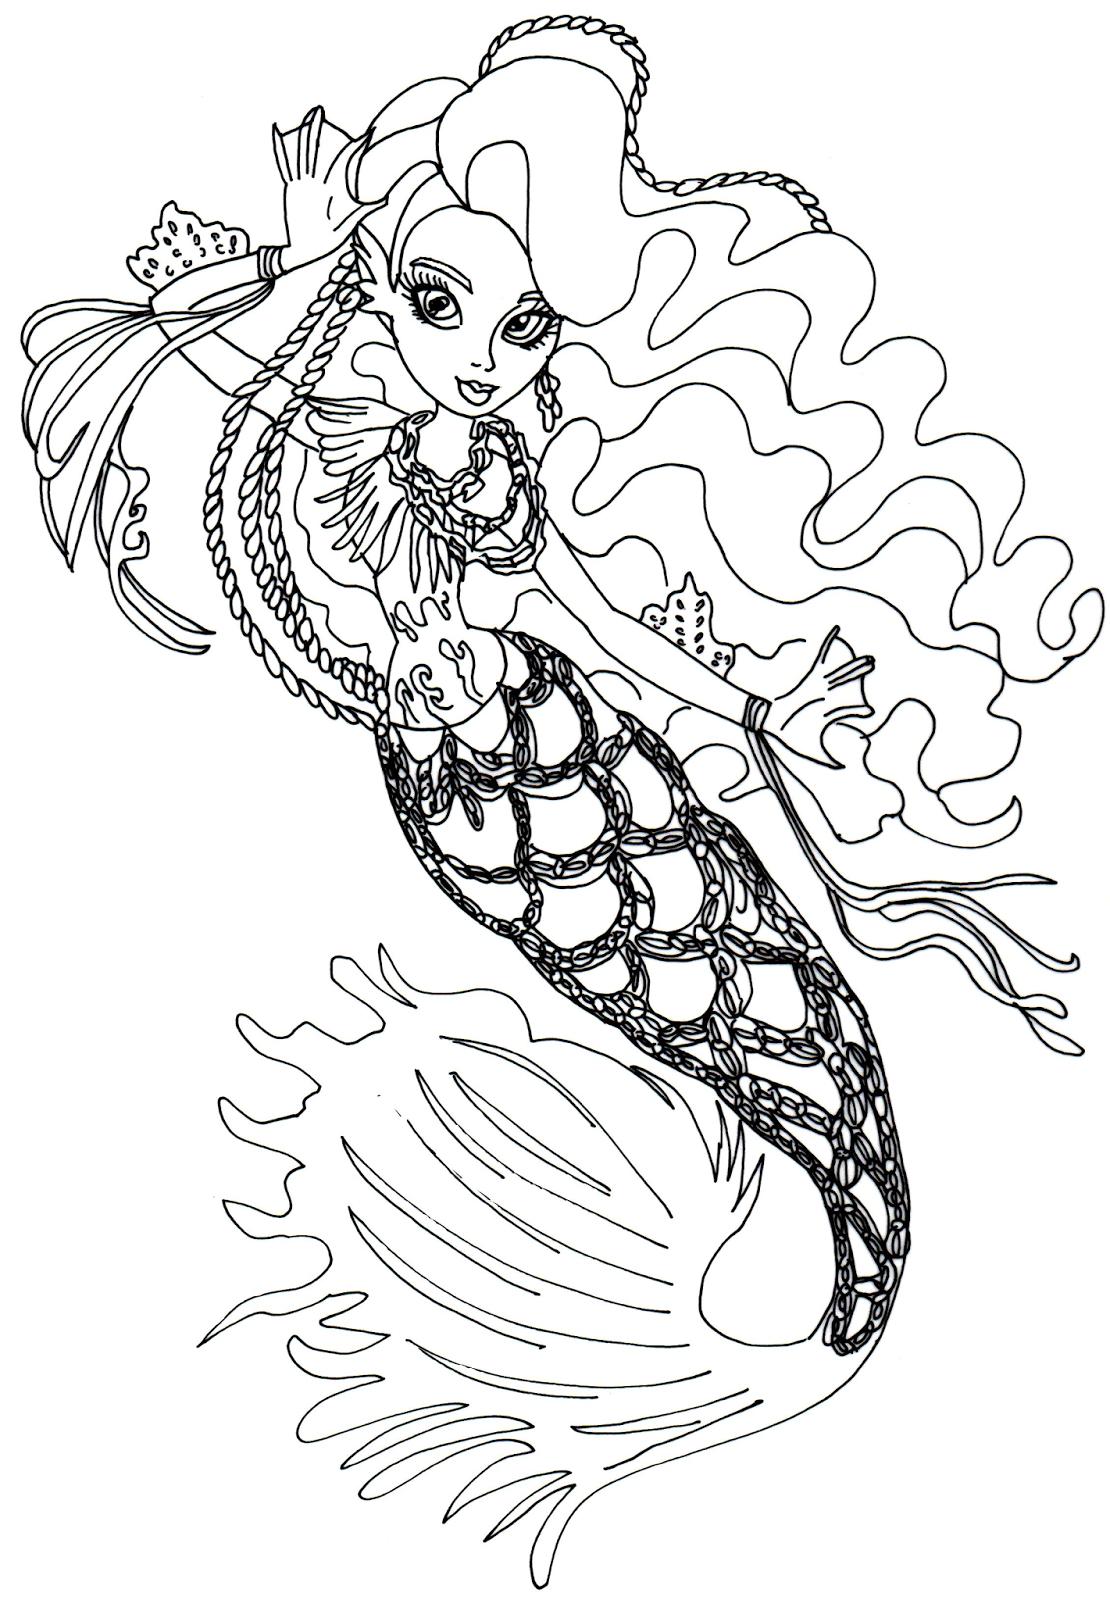 Monster High Free Printables | Free Printable Monster High Coloring - Monster High Free Printable Pictures